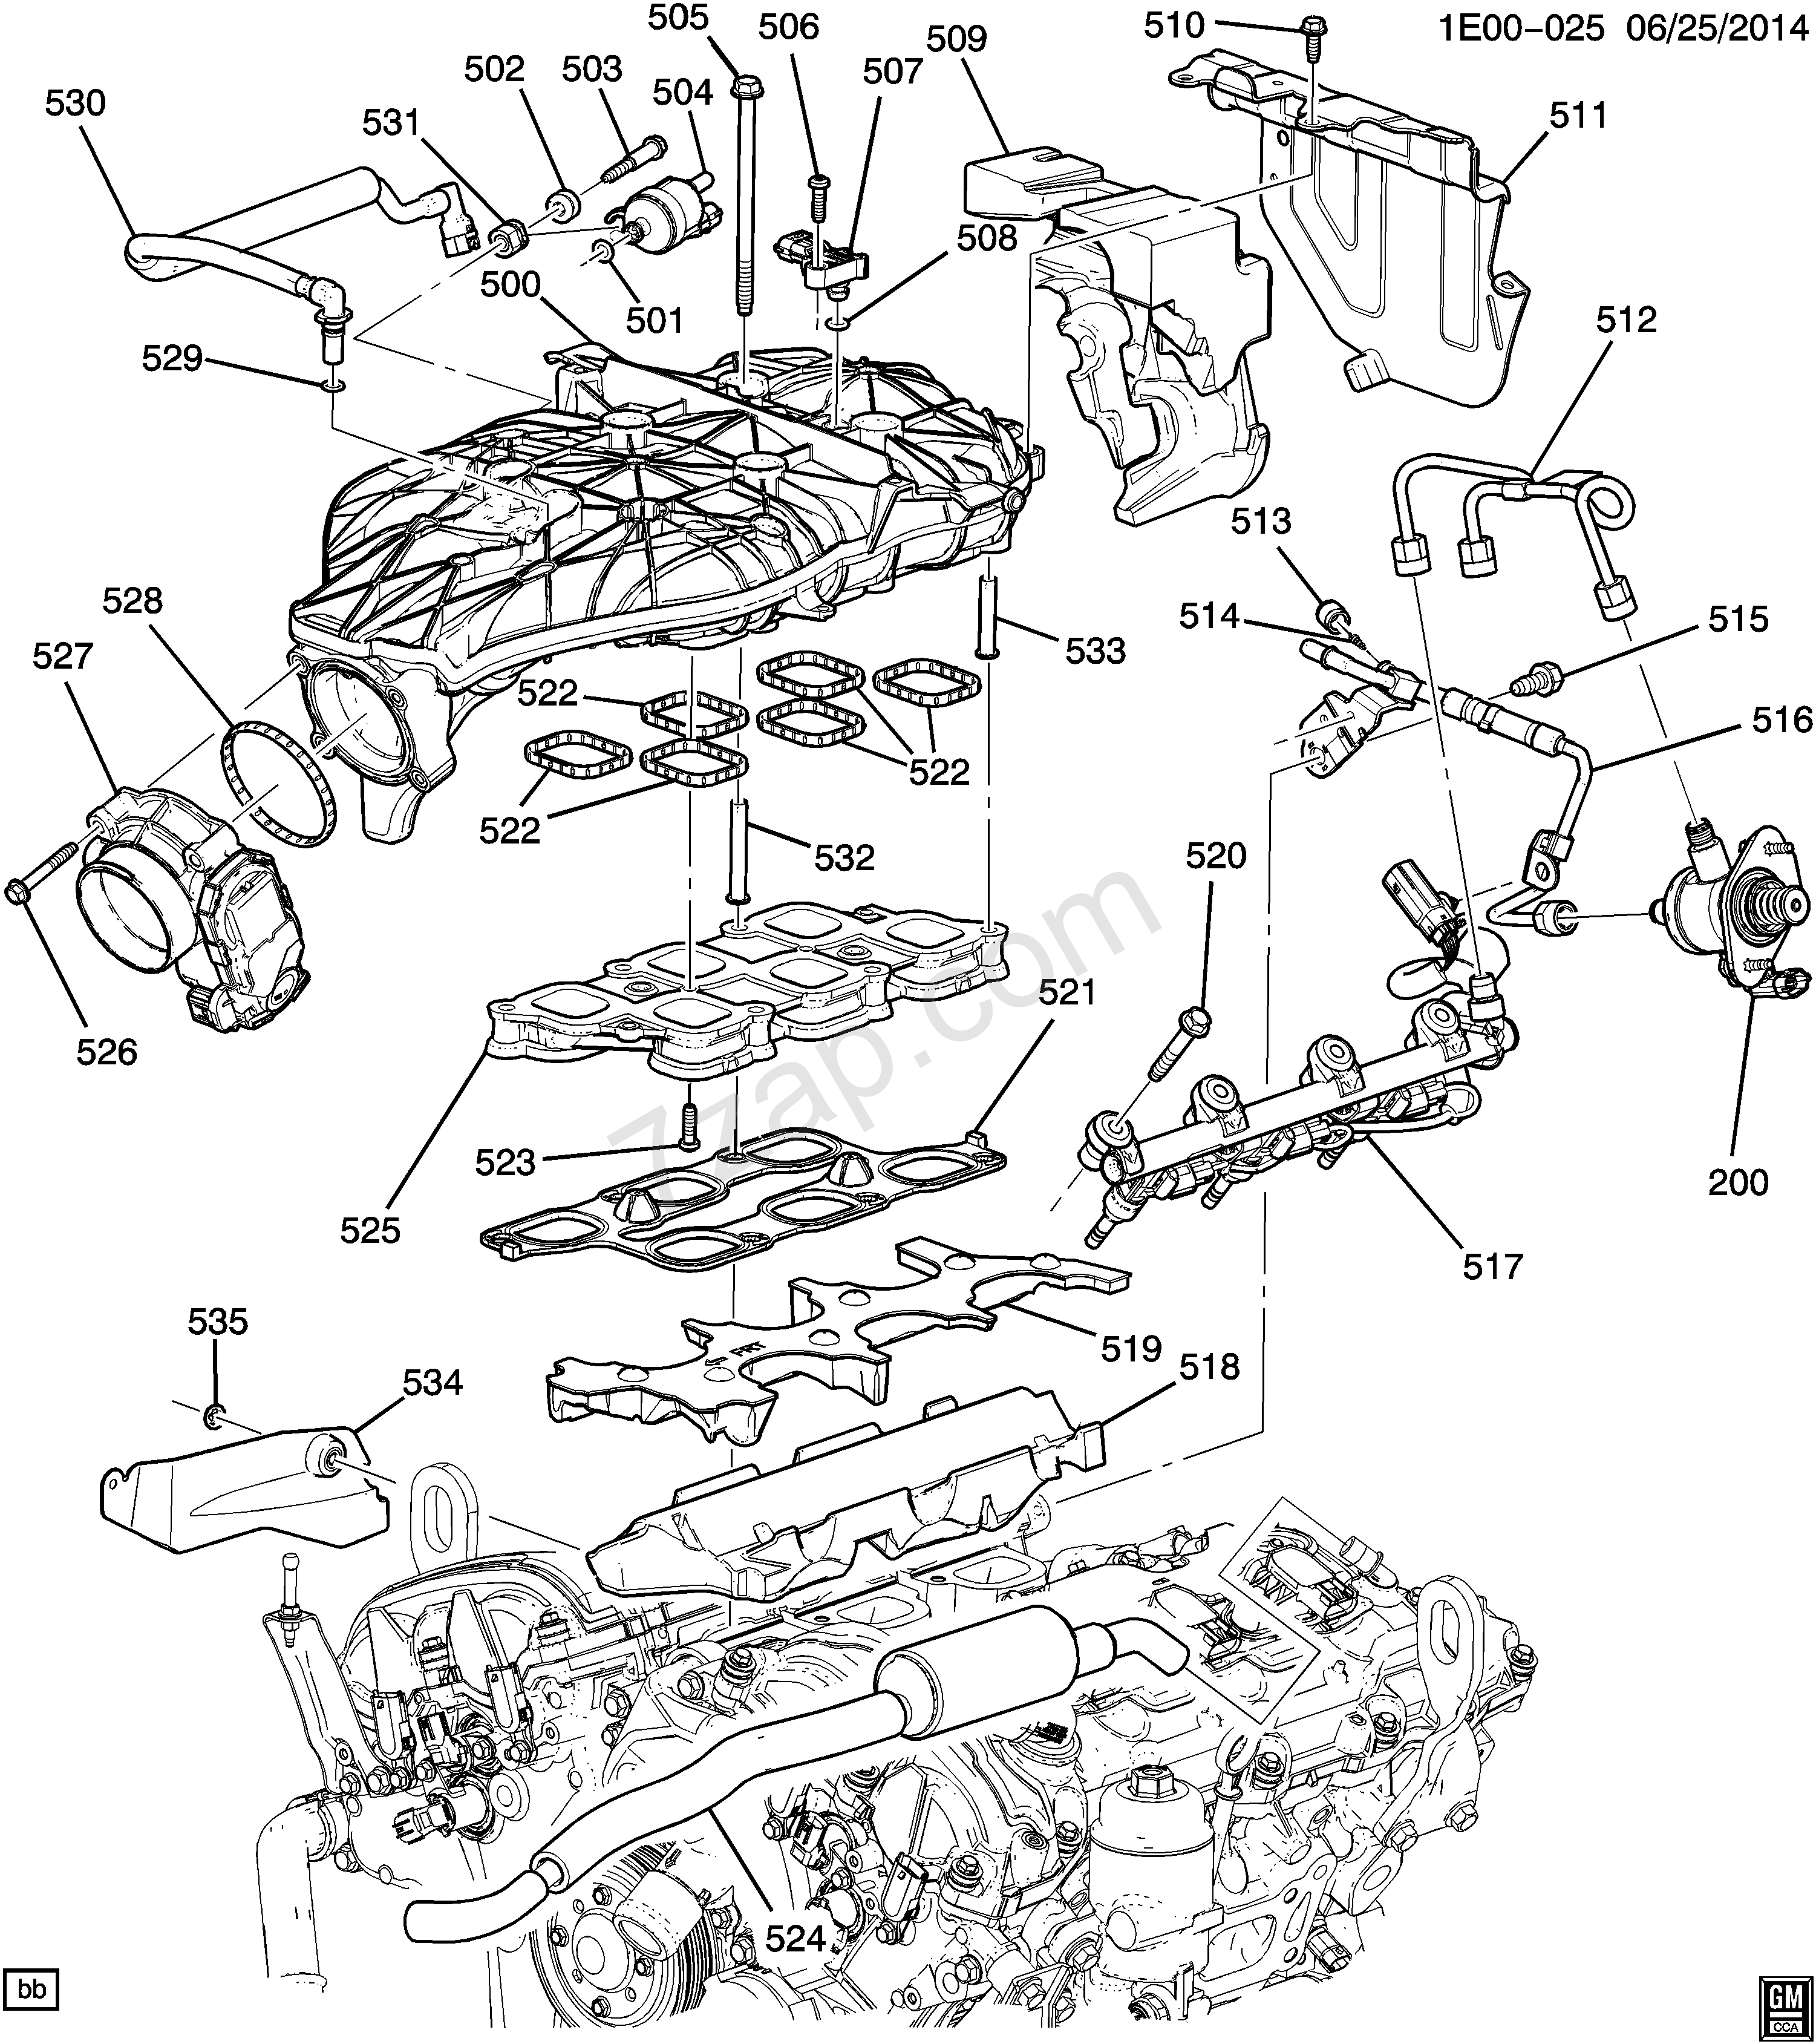 Ex 0838  2014 Chevy Camaro V6 Engine Diagram Wiring Diagram